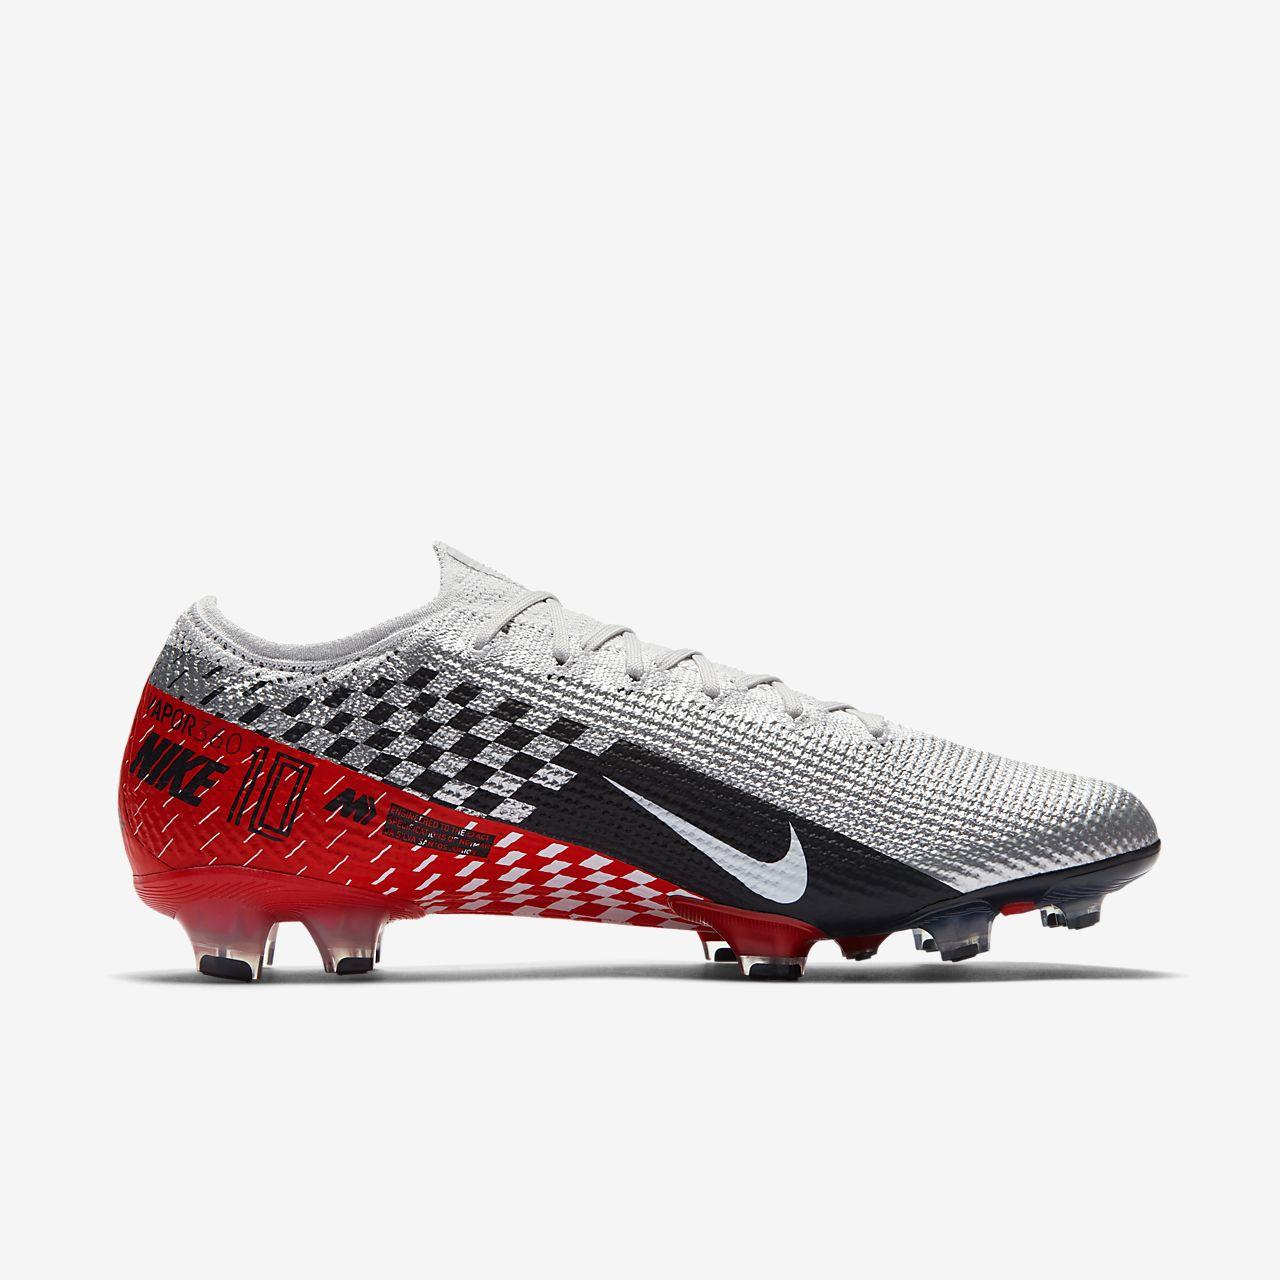 Nike Mercurial Vapor 13 Elite Neymar Jr. FG Firm Ground Soccer Cleat